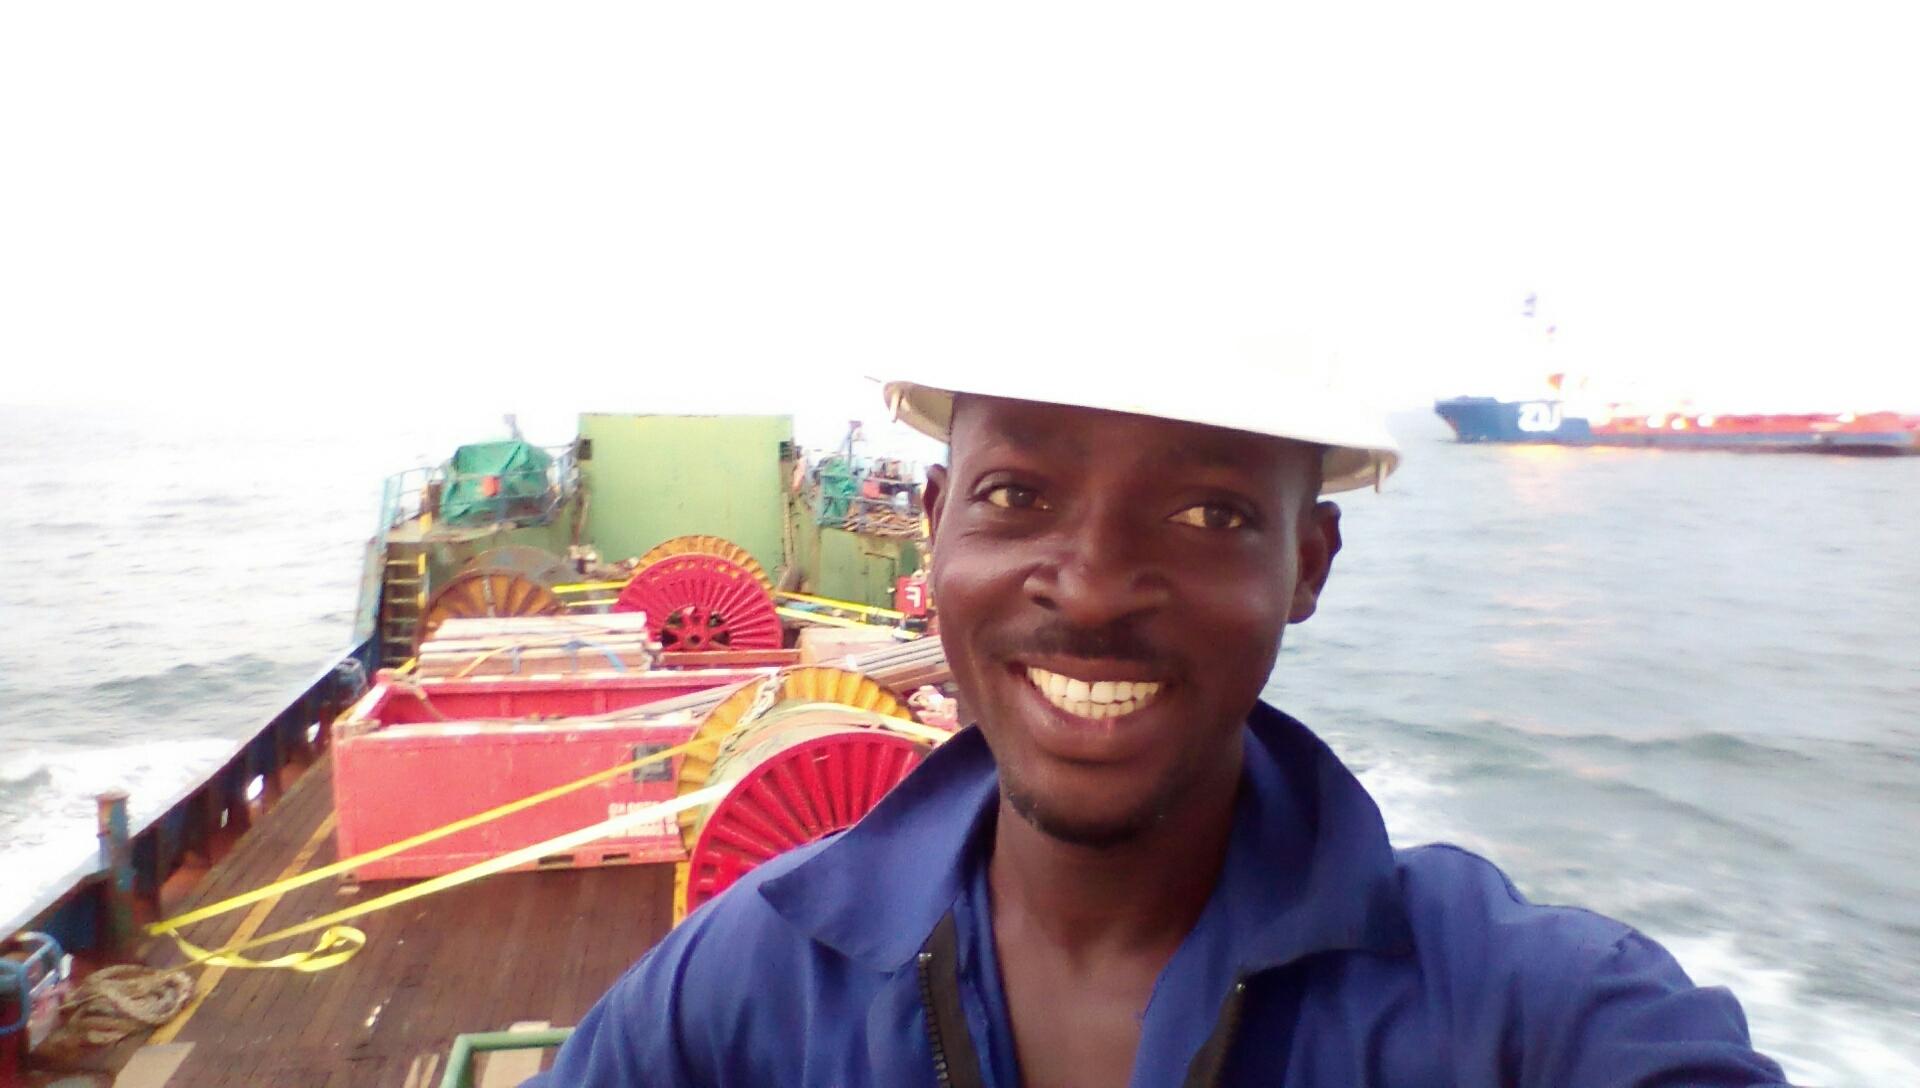 Seth Tamakloe seafarer Able Seaman Tug Boat